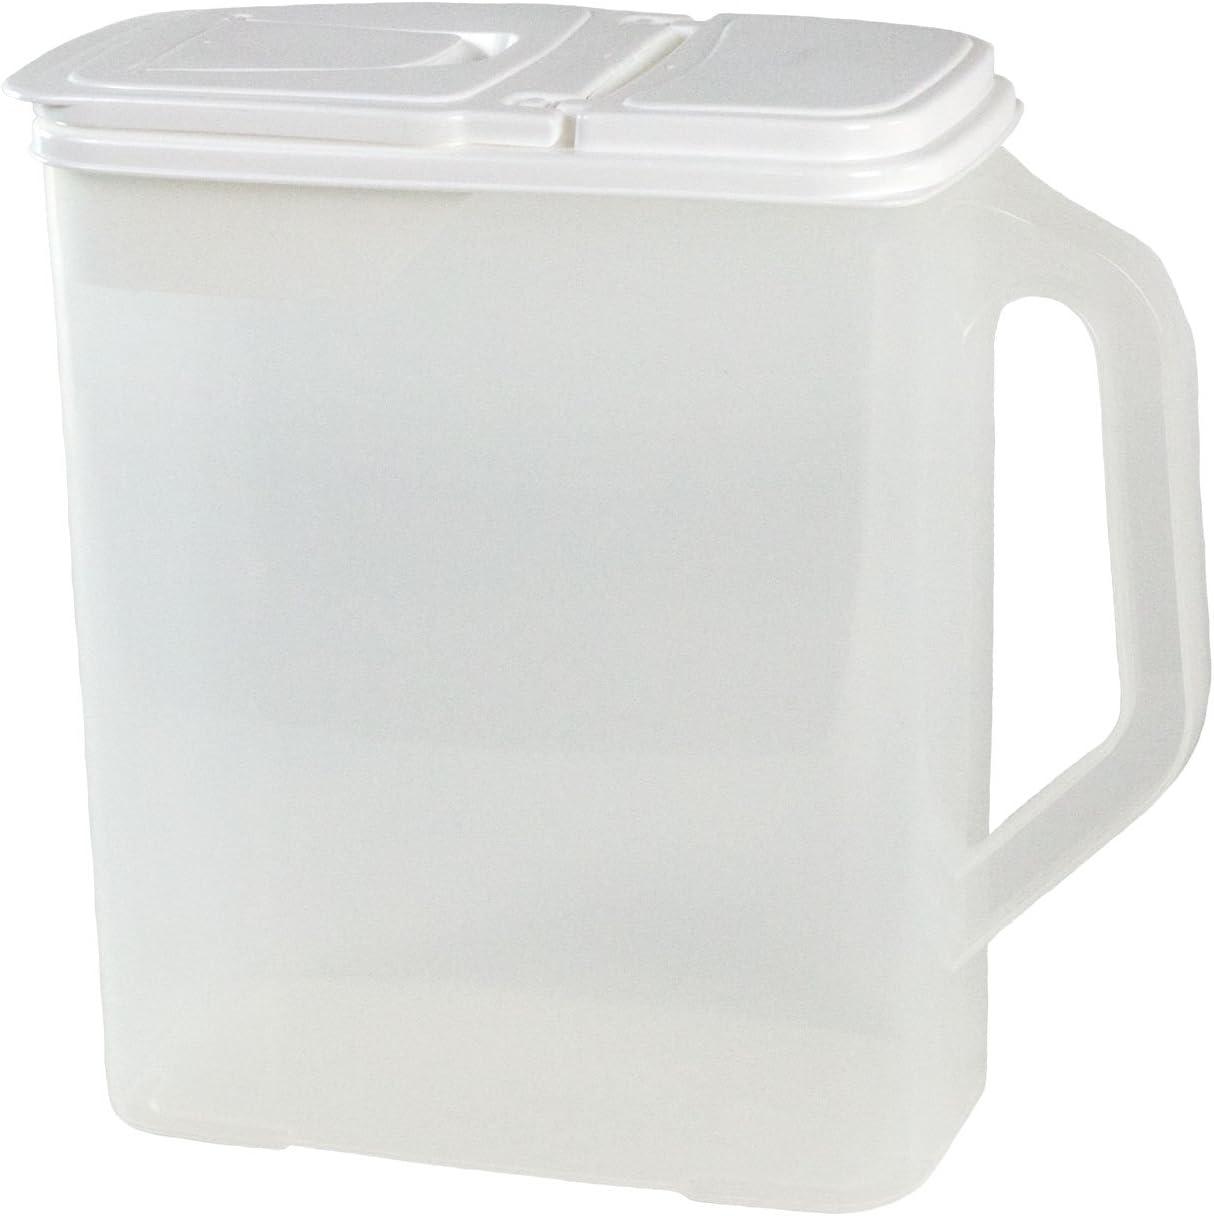 Mainstays Storage Dispenser 32 Cup BPA Free